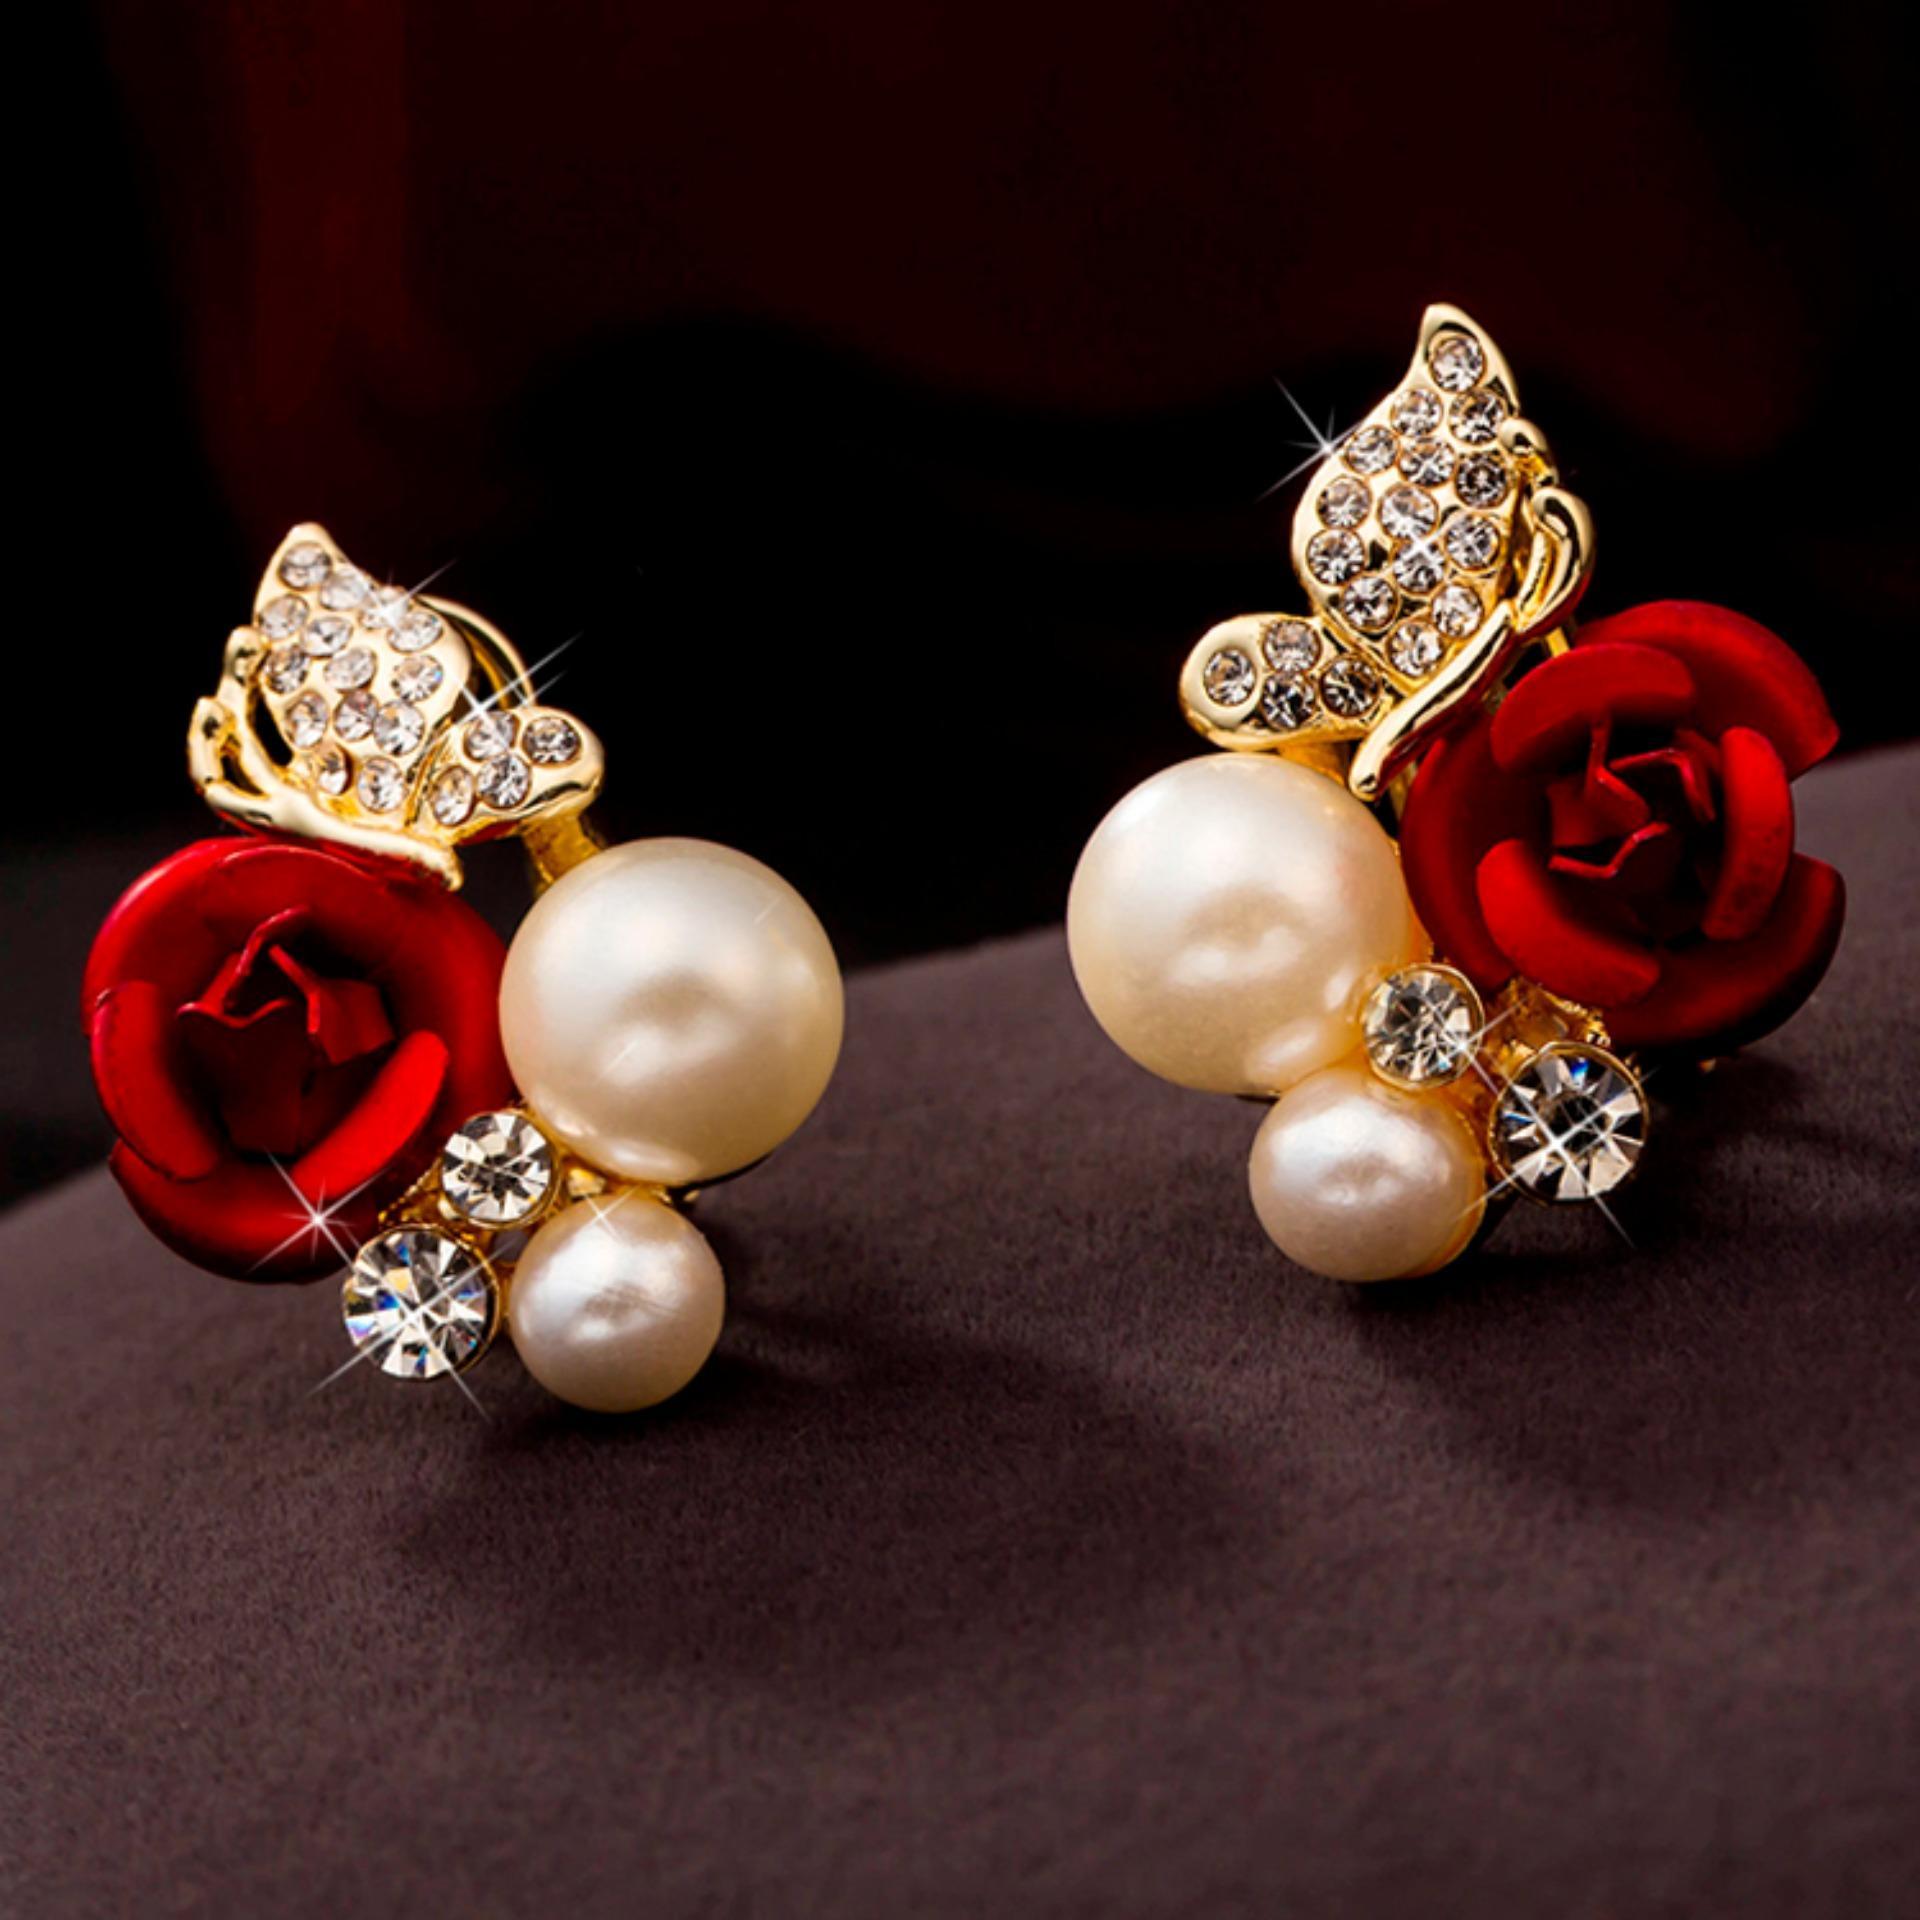 luxury-gold-plated-chain-link-bracelet-for-women-ladies-shining-aaa-cubic-zircon-crystal-birthday-jewelry-gift-0-intl-9490-10424361-421a73d58856009bdbc18cf2ed0533f8-catalog_233 List Harga Daftar Harga Emas Perhiasan Per Gram Termurah Februari 2019